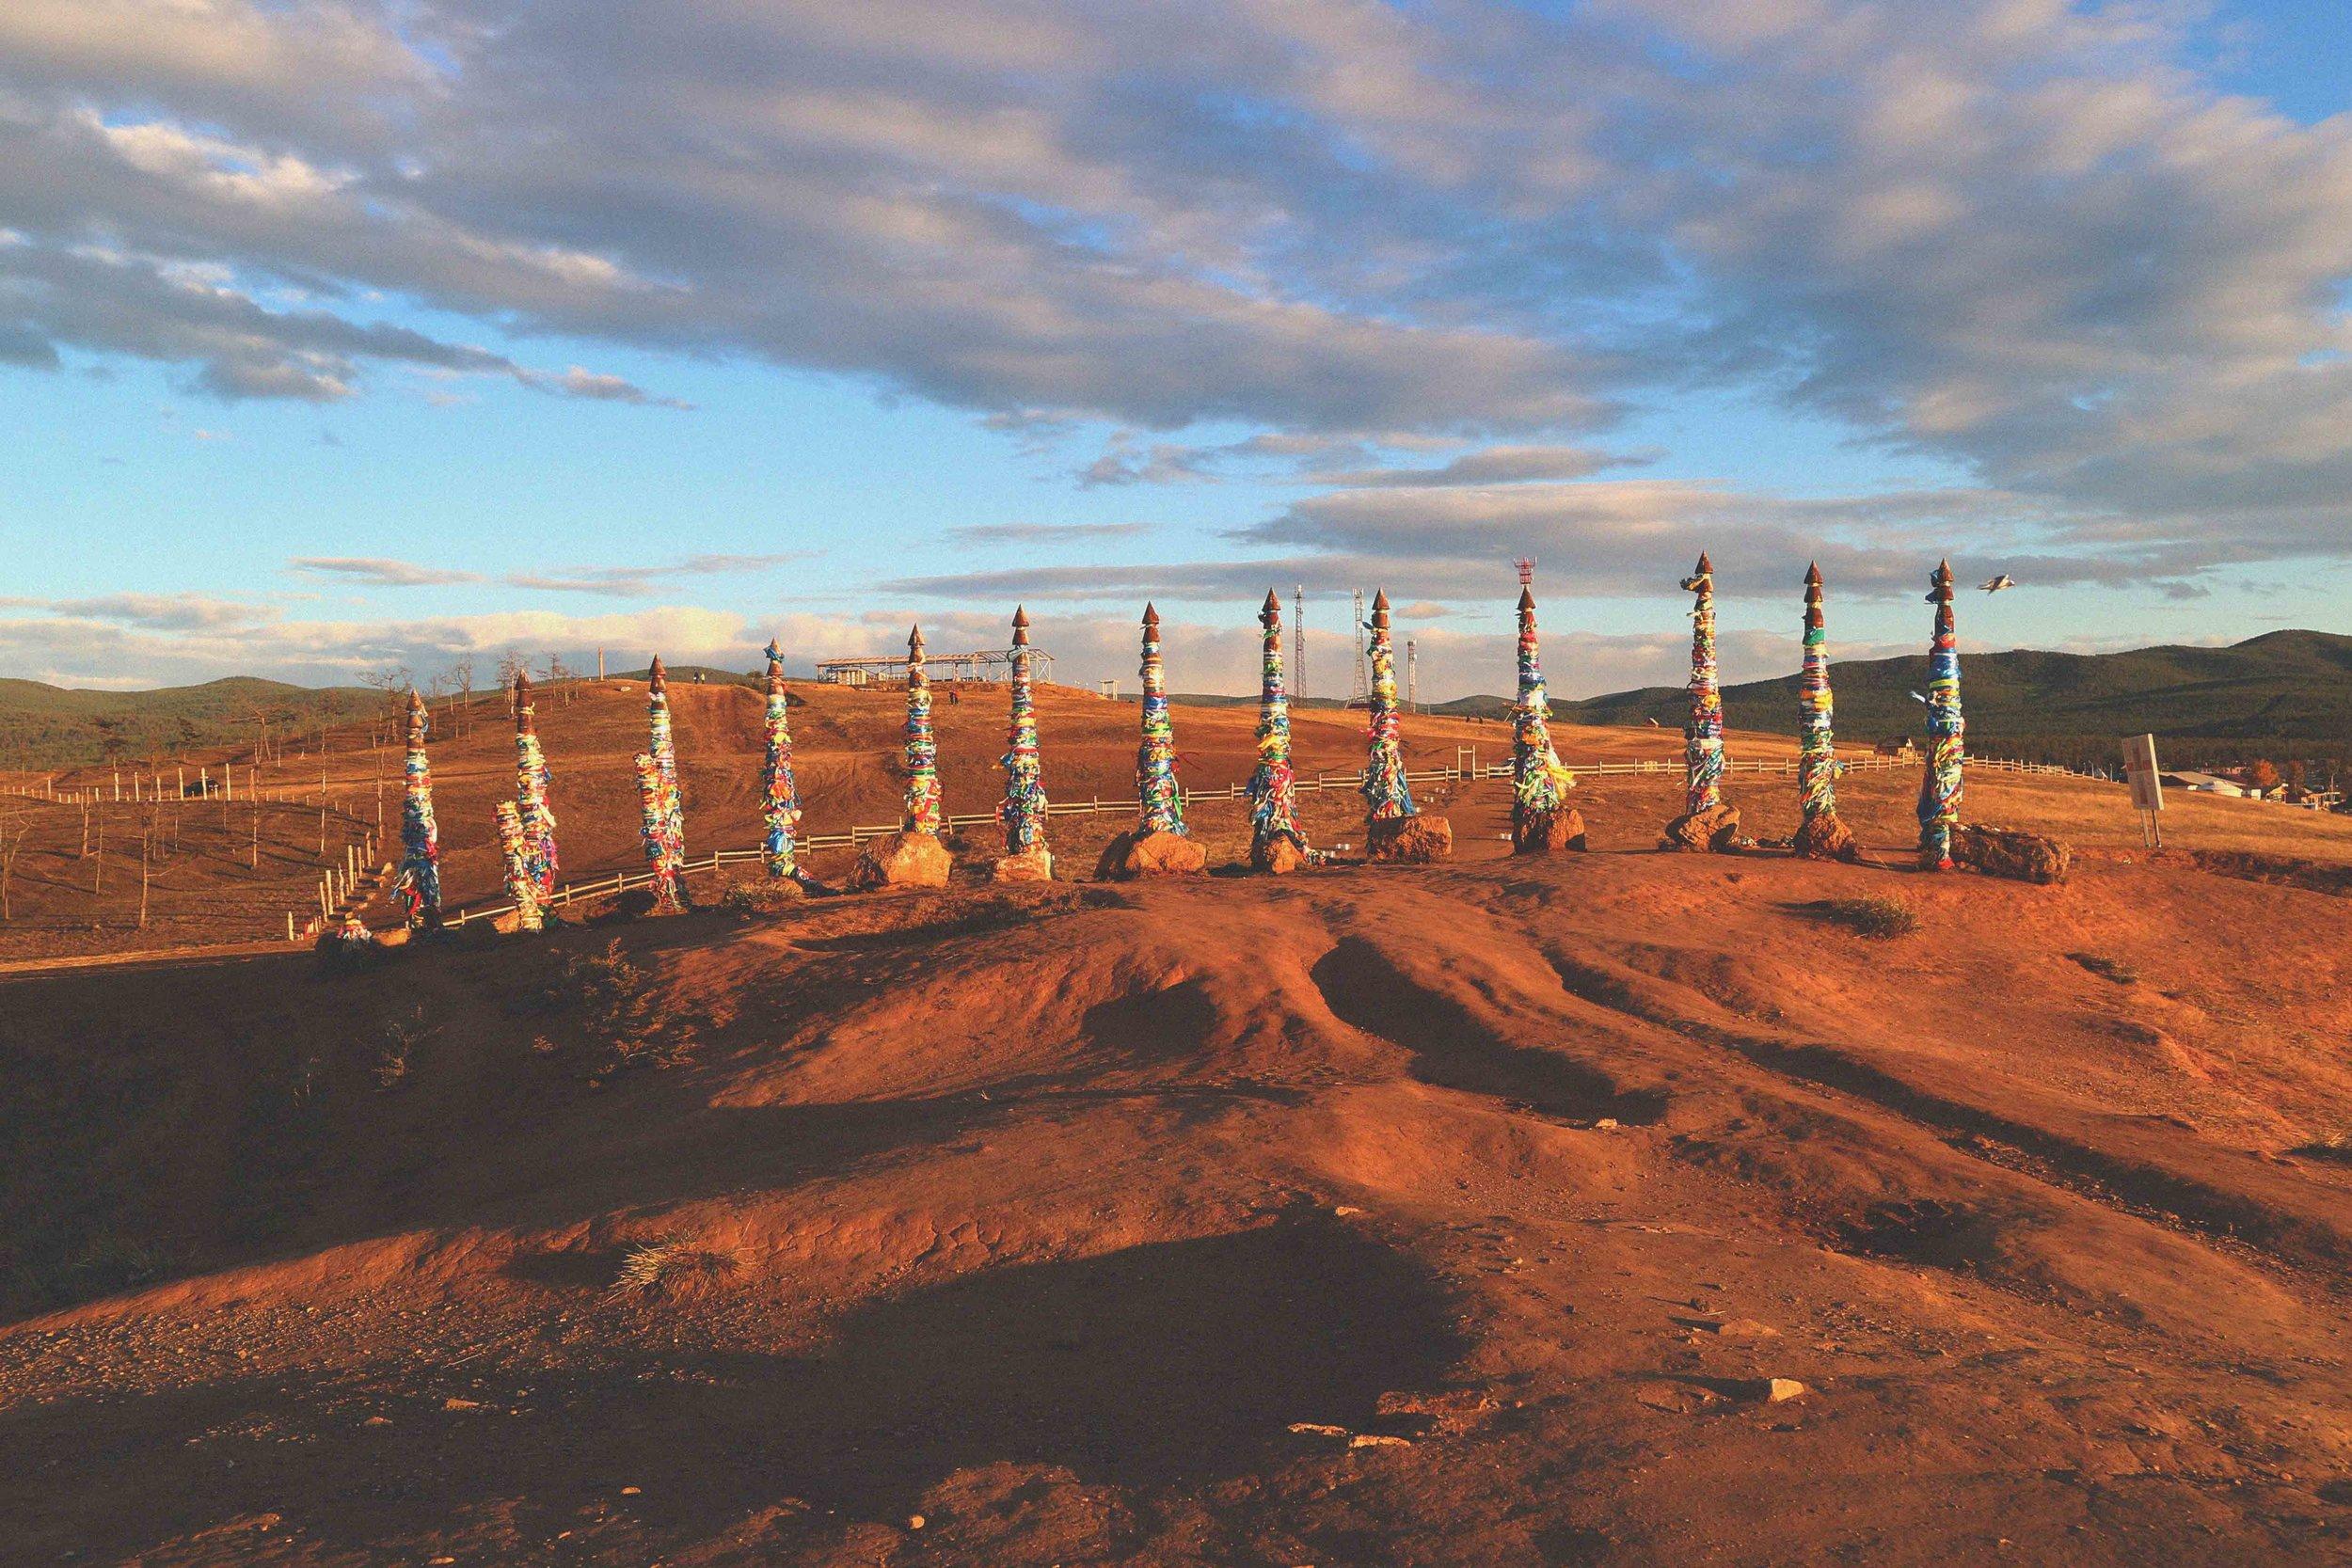 The Shaman poles